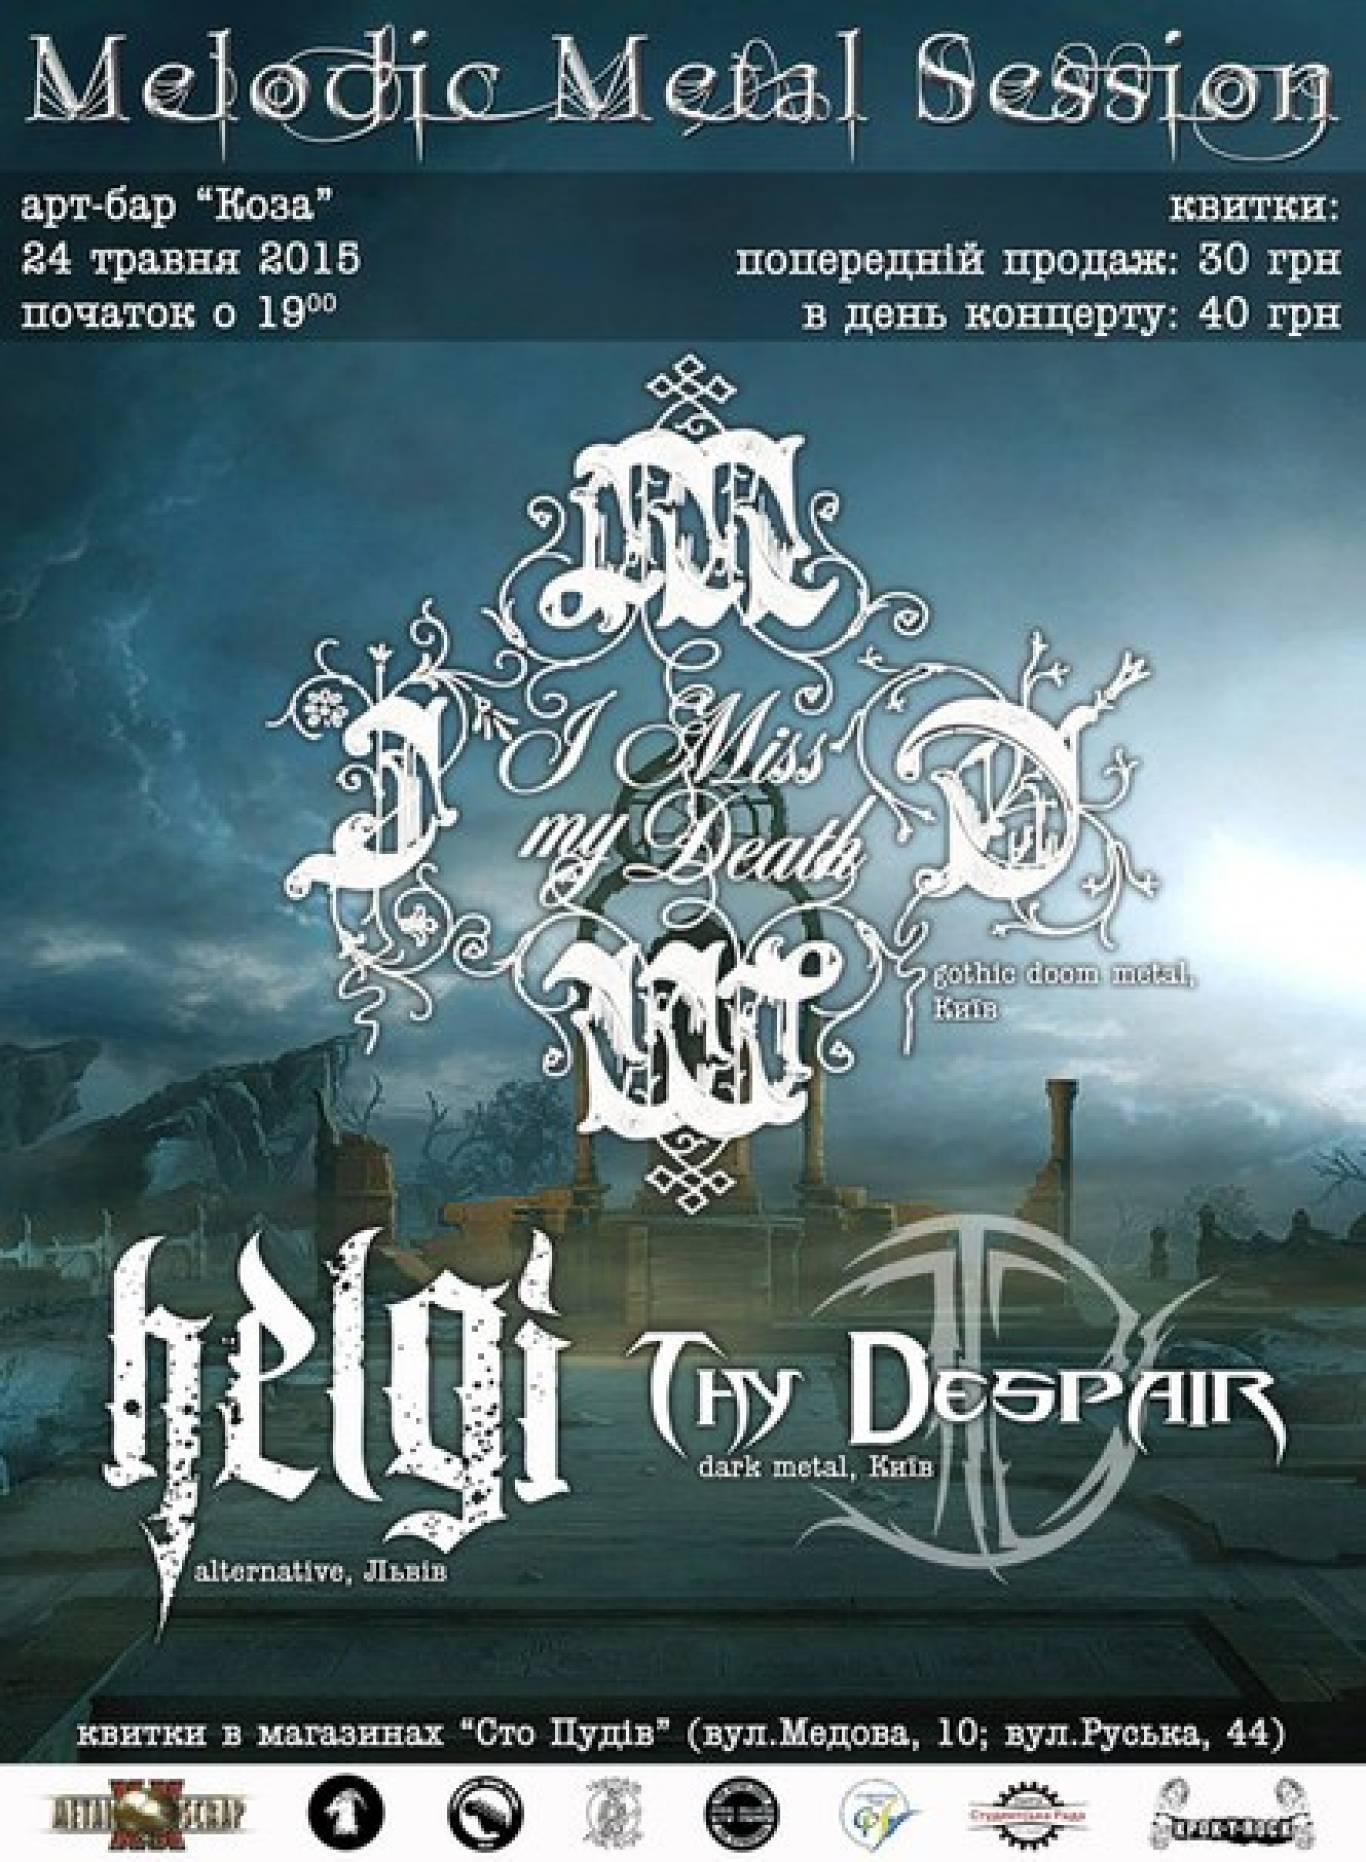 Melodic Metal Session VI